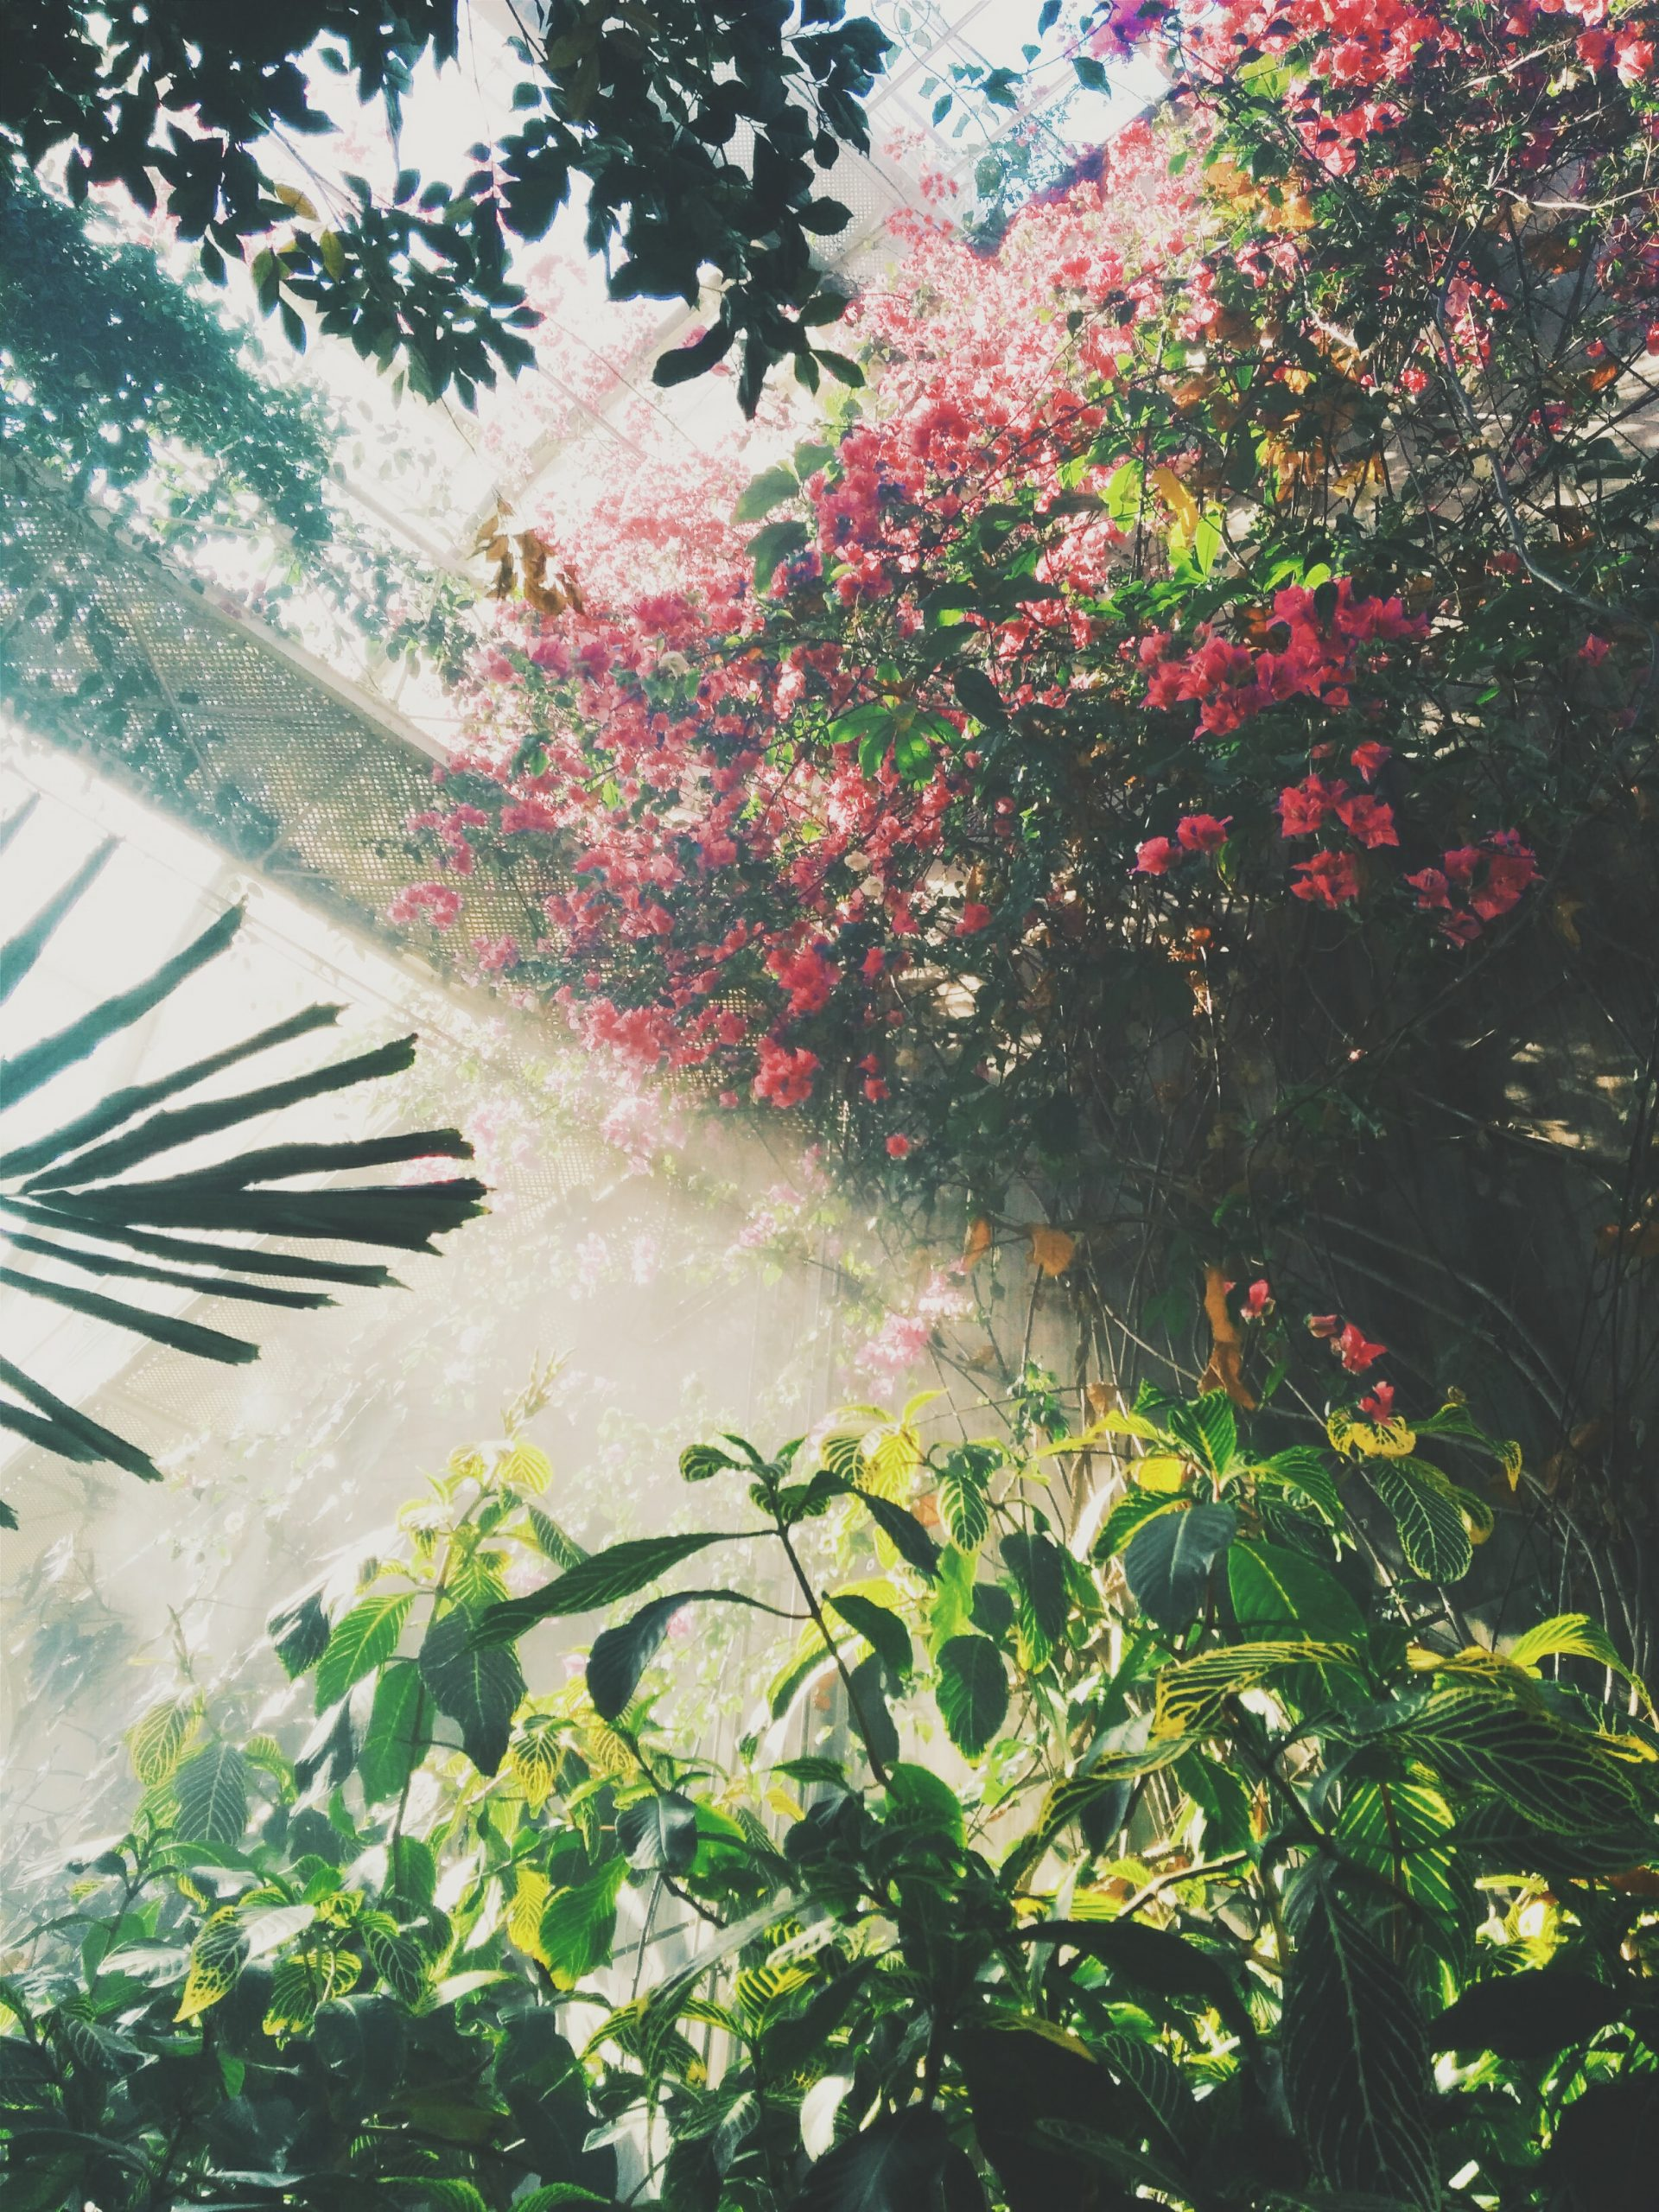 Tuinman DelFauw: A Gardeners Dream